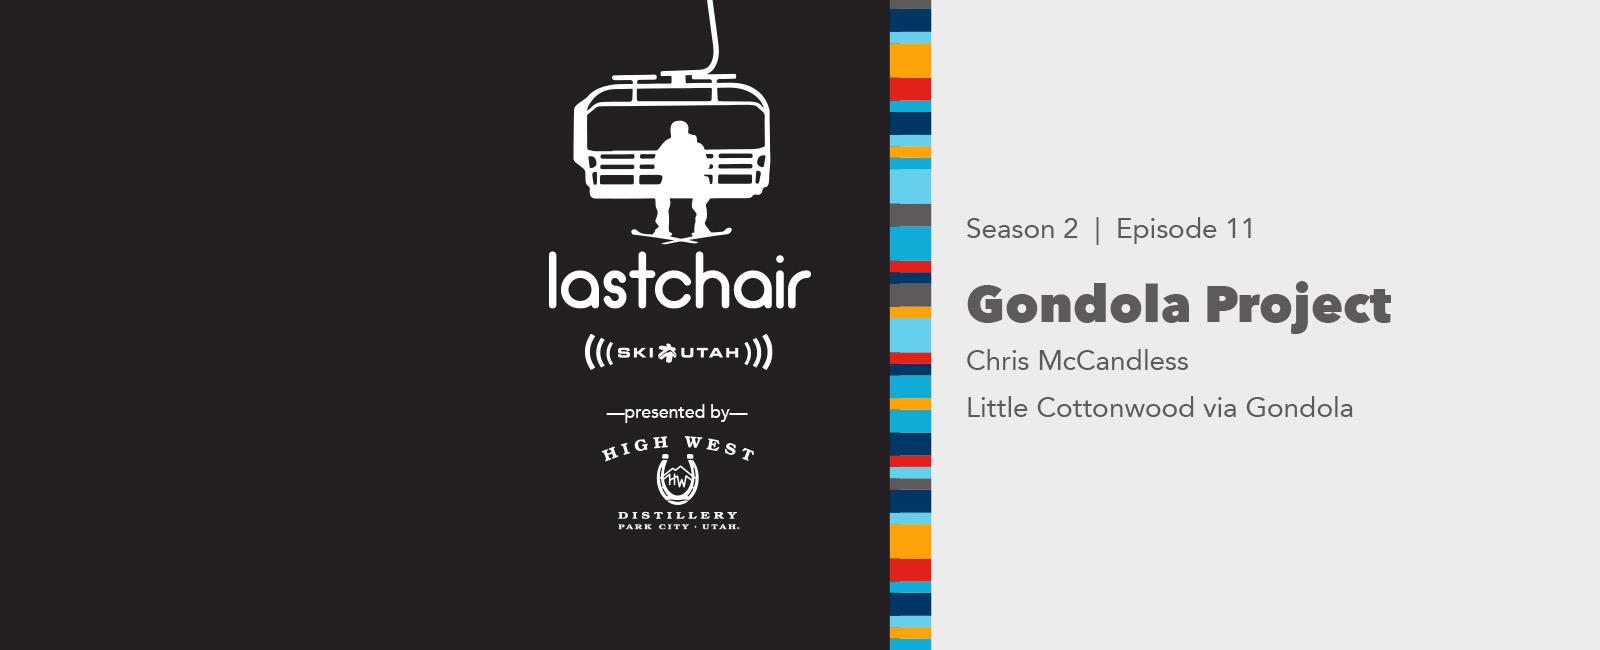 Chris McCandless: Little Cottonwood Via Gondola